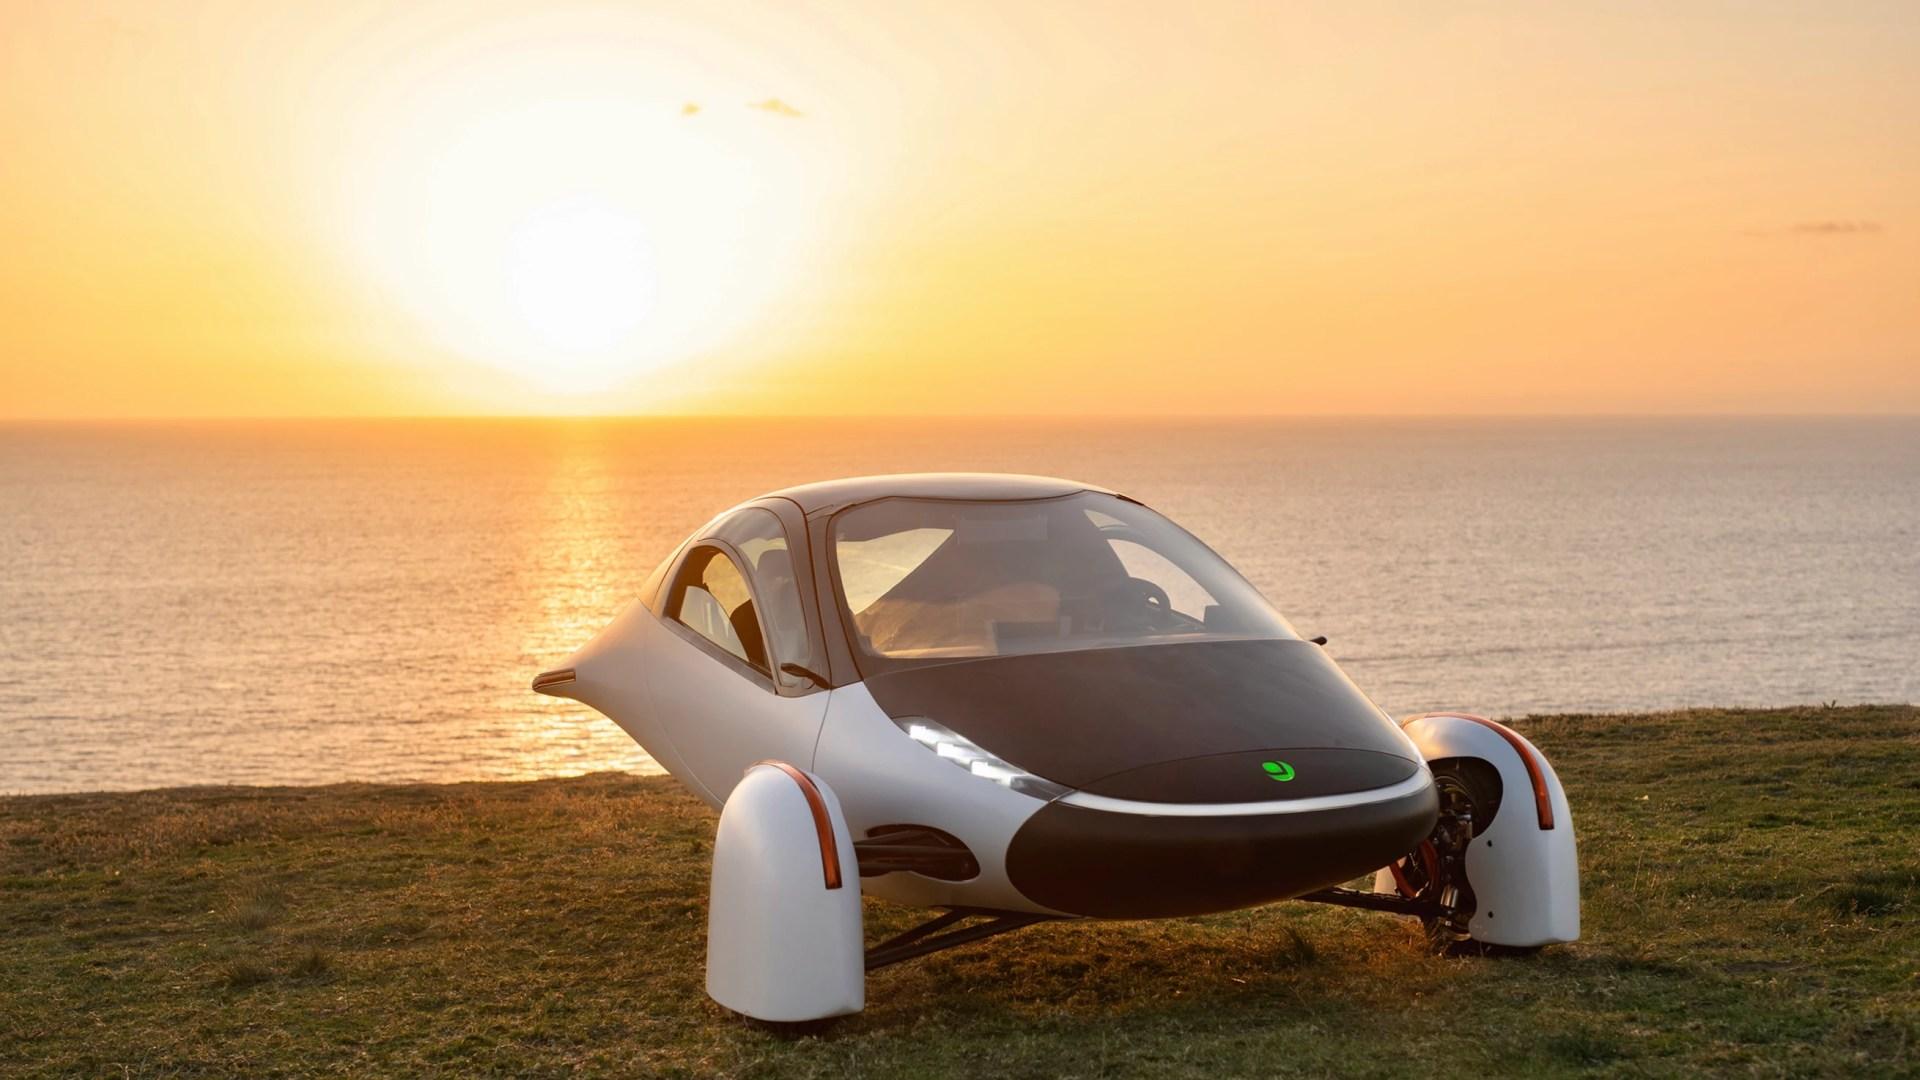 Elektroautos, Elektromobilität, Aptera Sol, sEVs, sEV